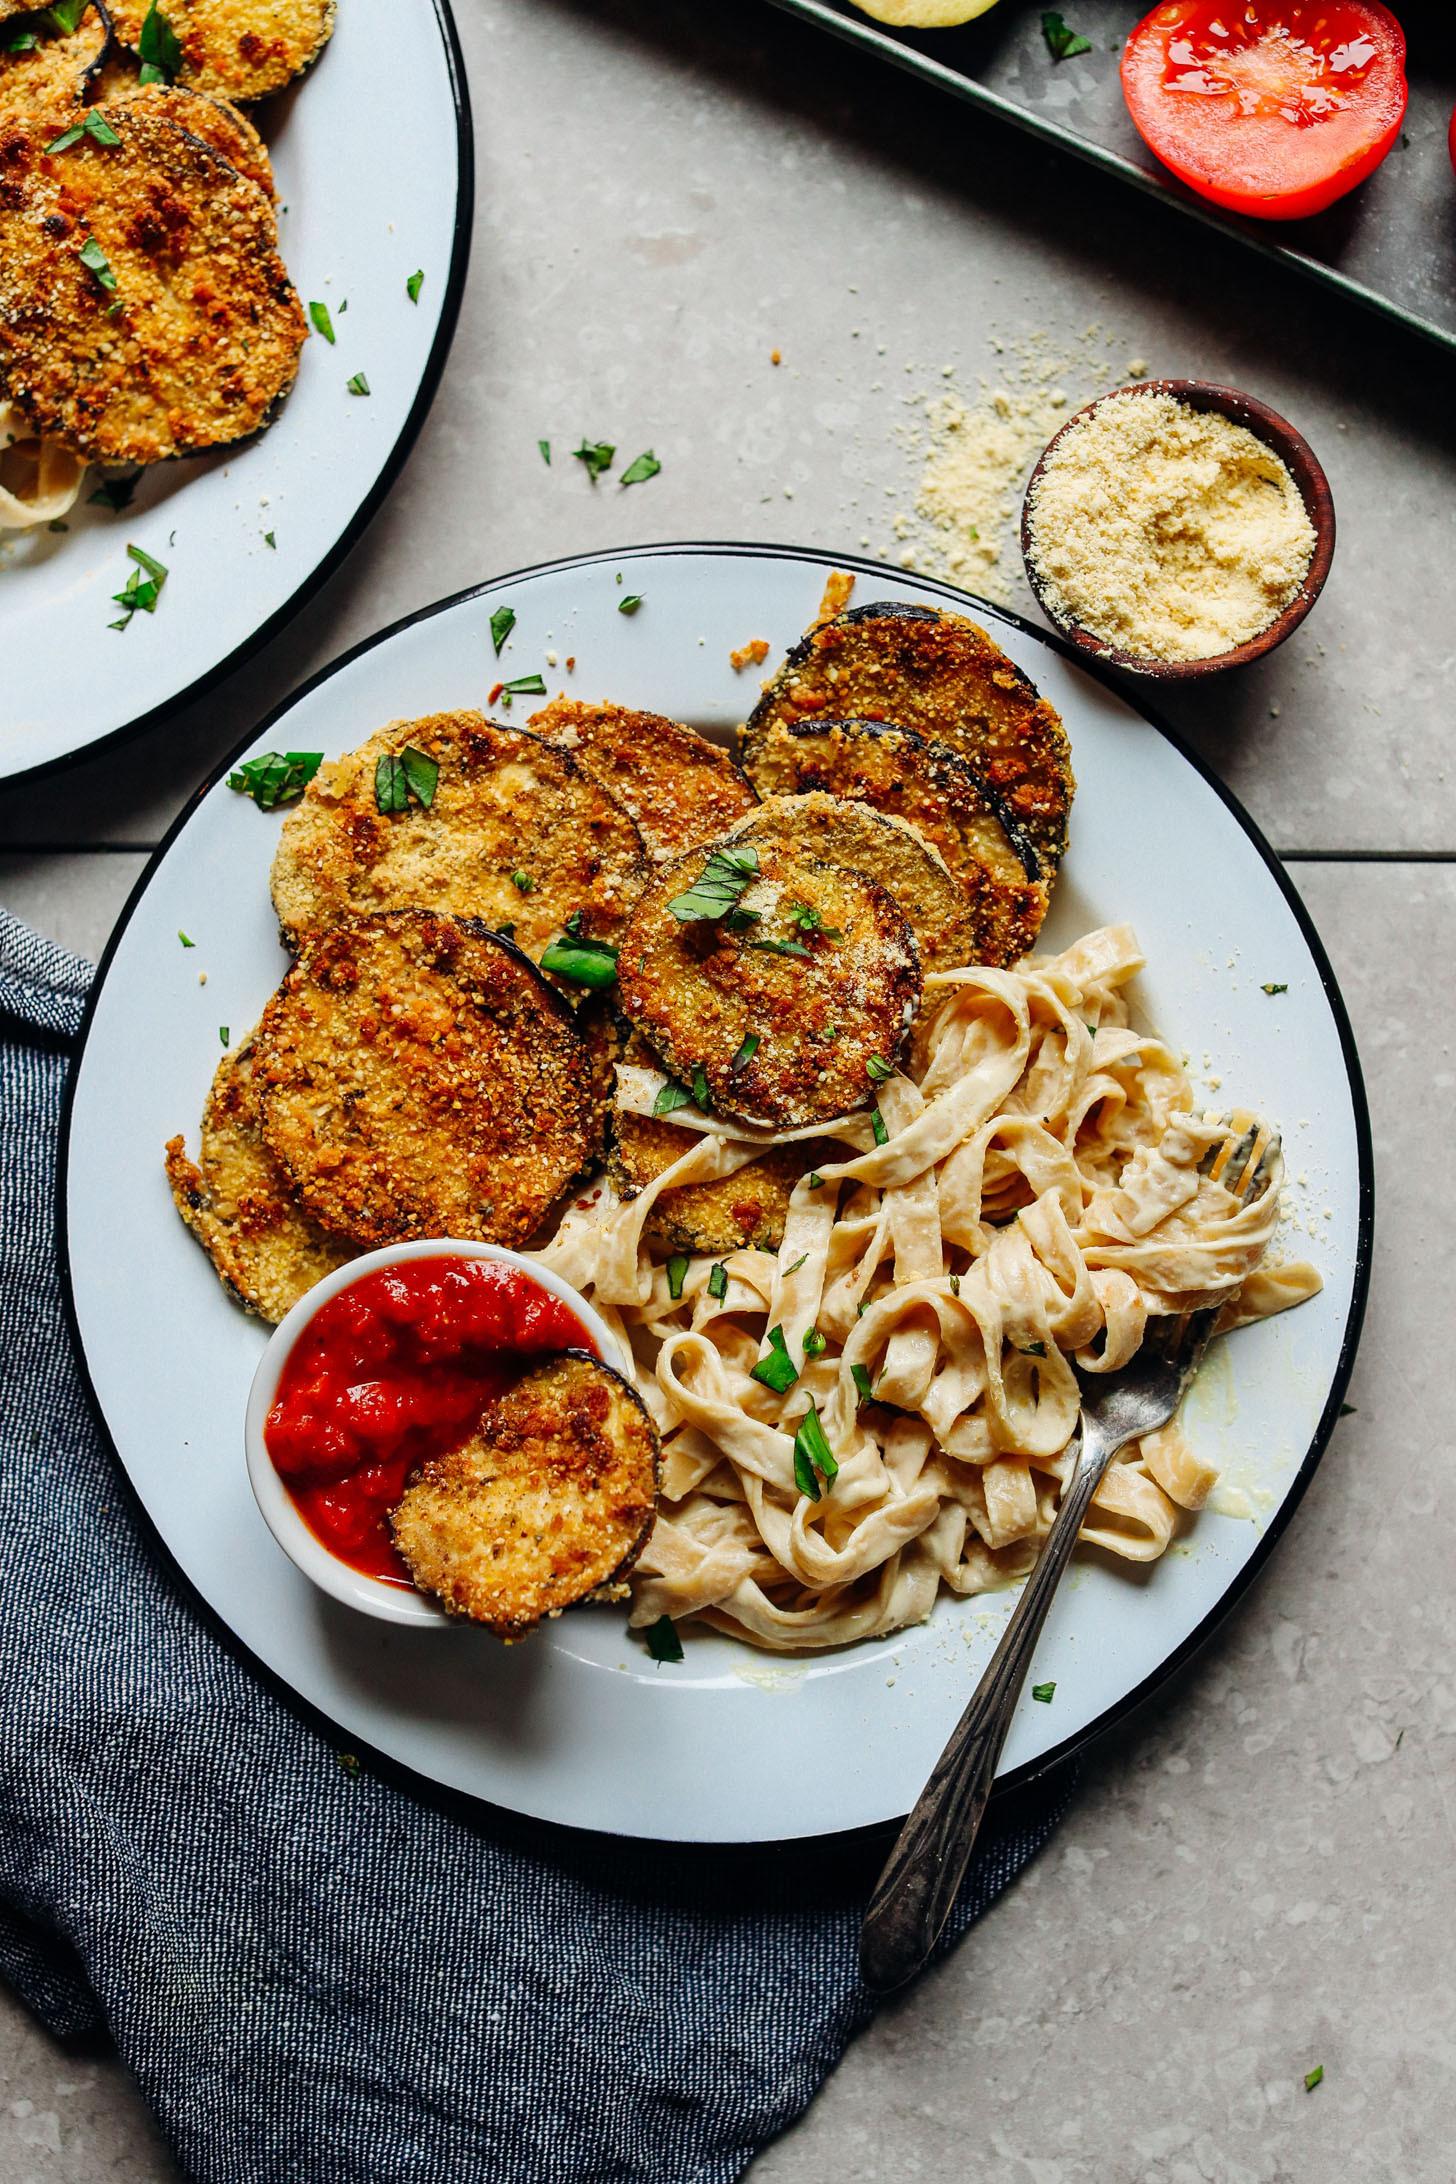 Tasty Dinner Recipes  Vegan Gluten Free Eggplant Parmesan